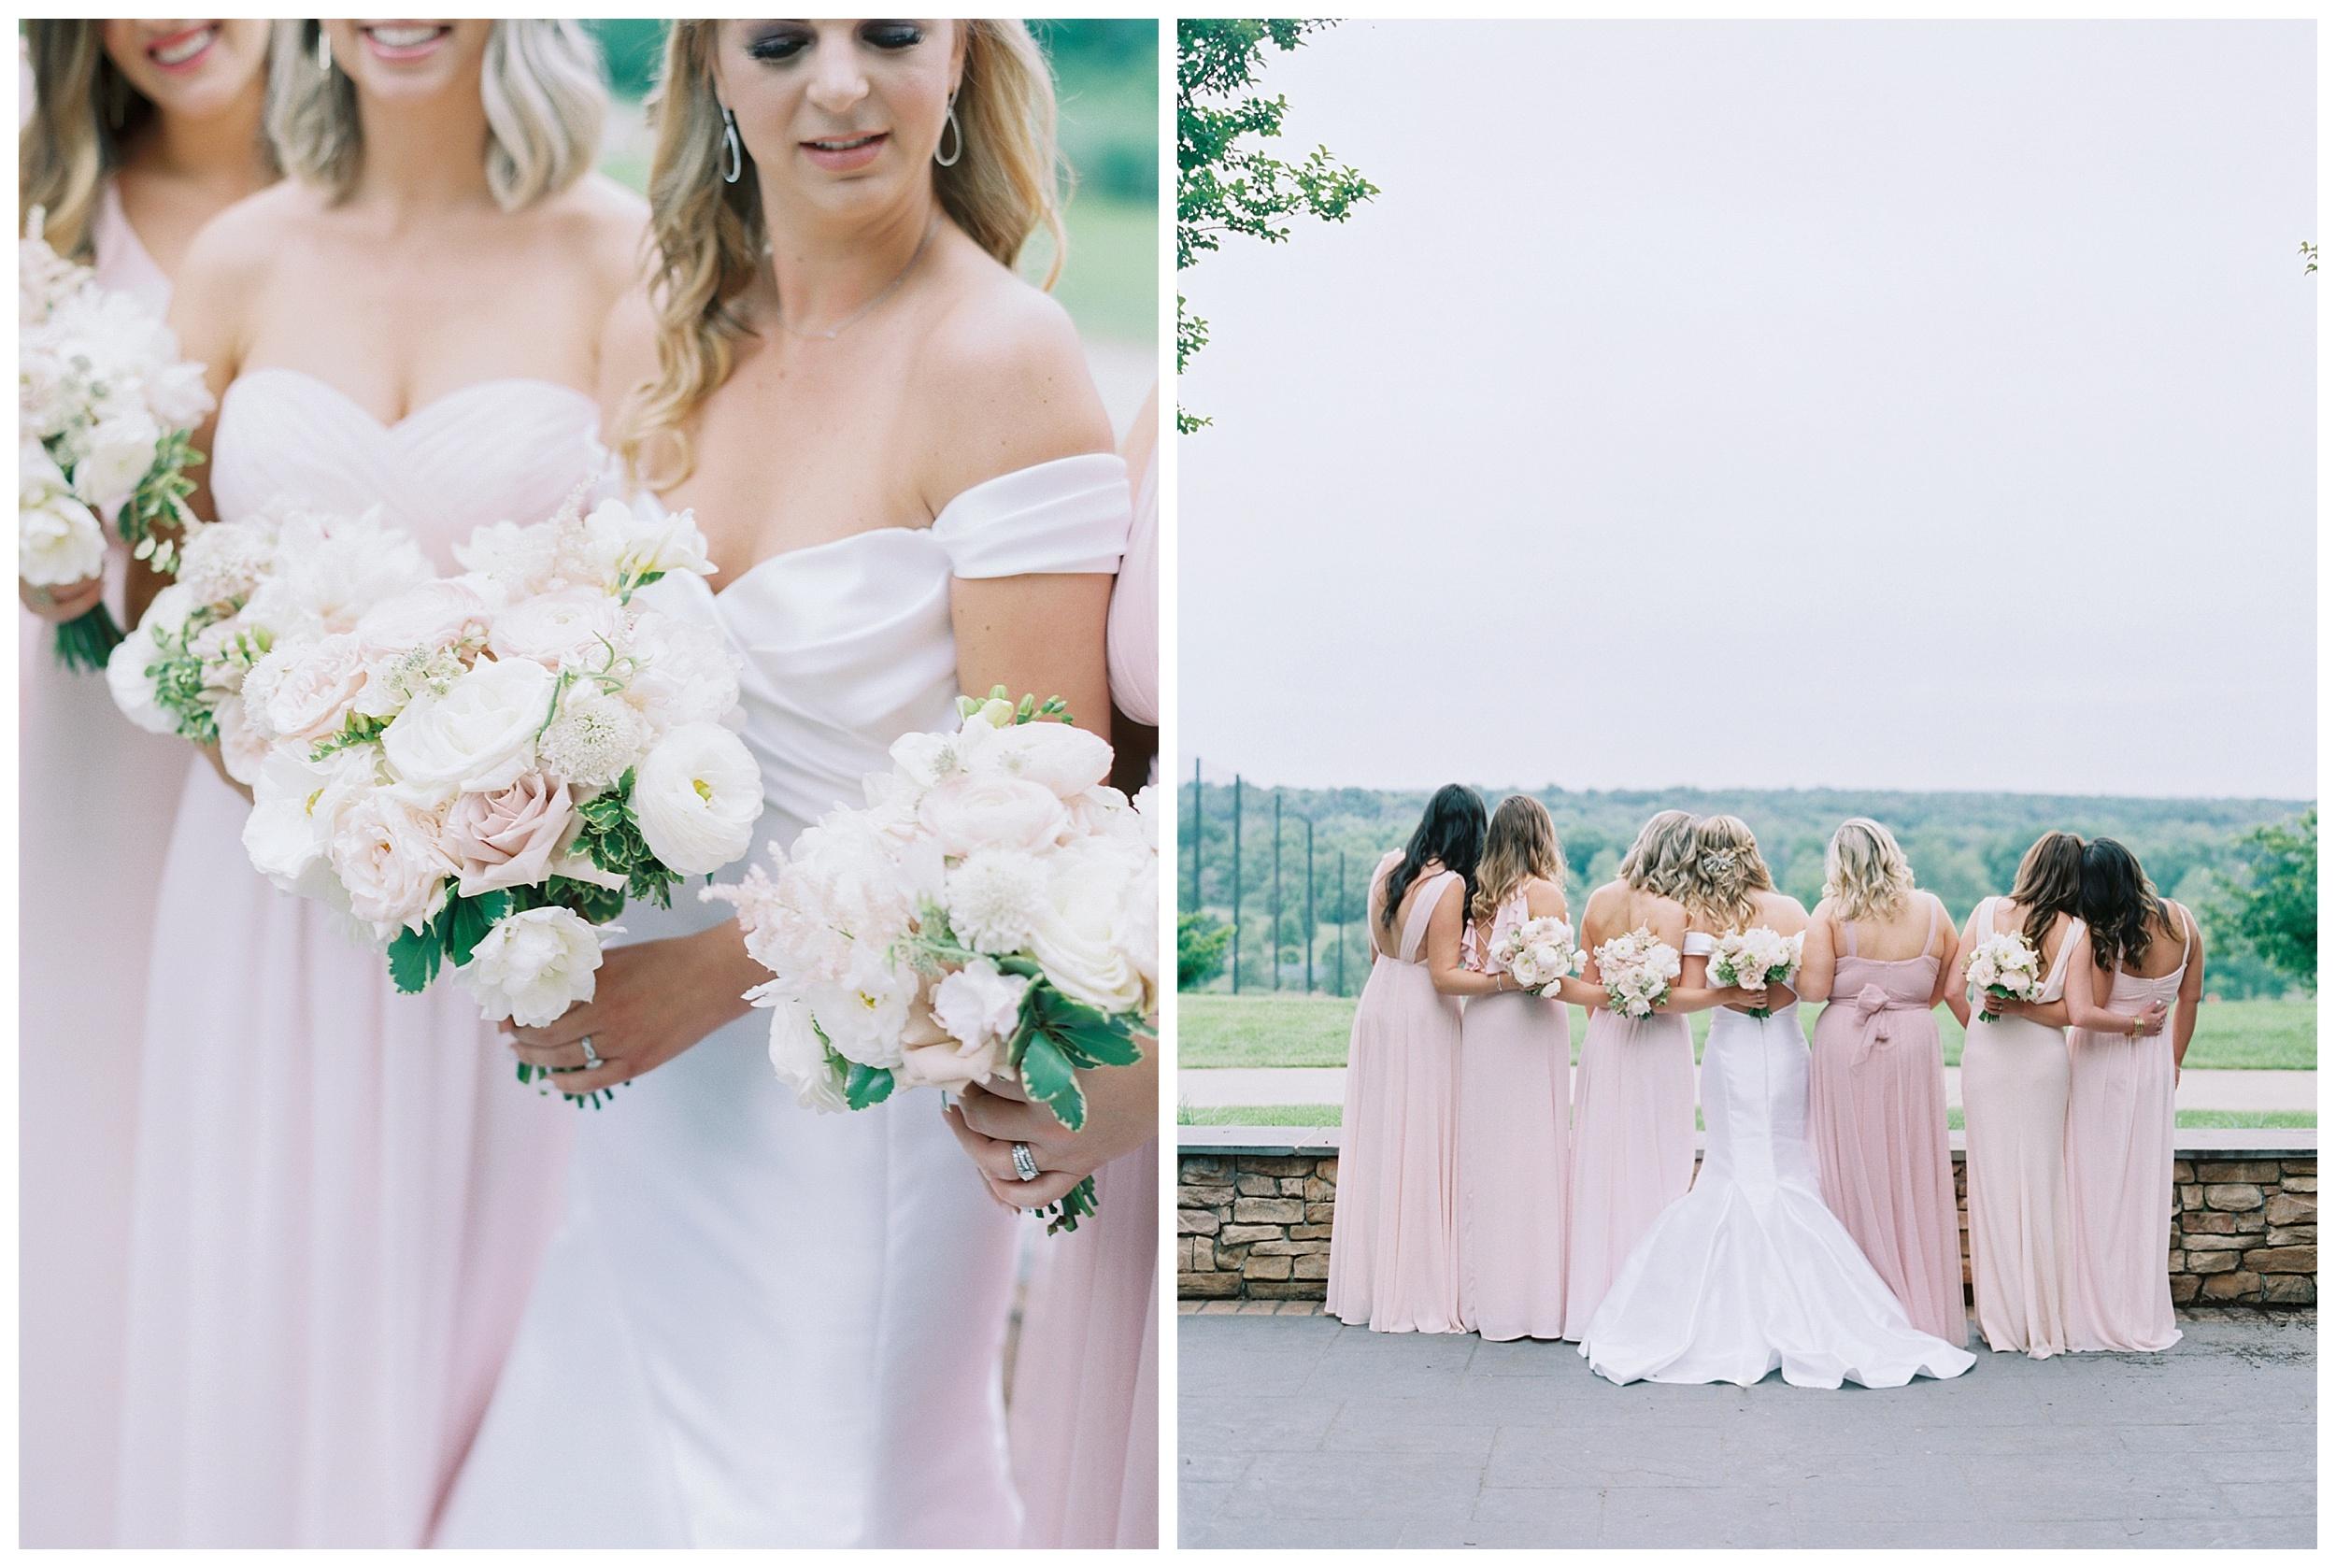 Lansdowne Resort Wedding | Virginia Film Wedding Photographer Kir Tuben_0023.jpg